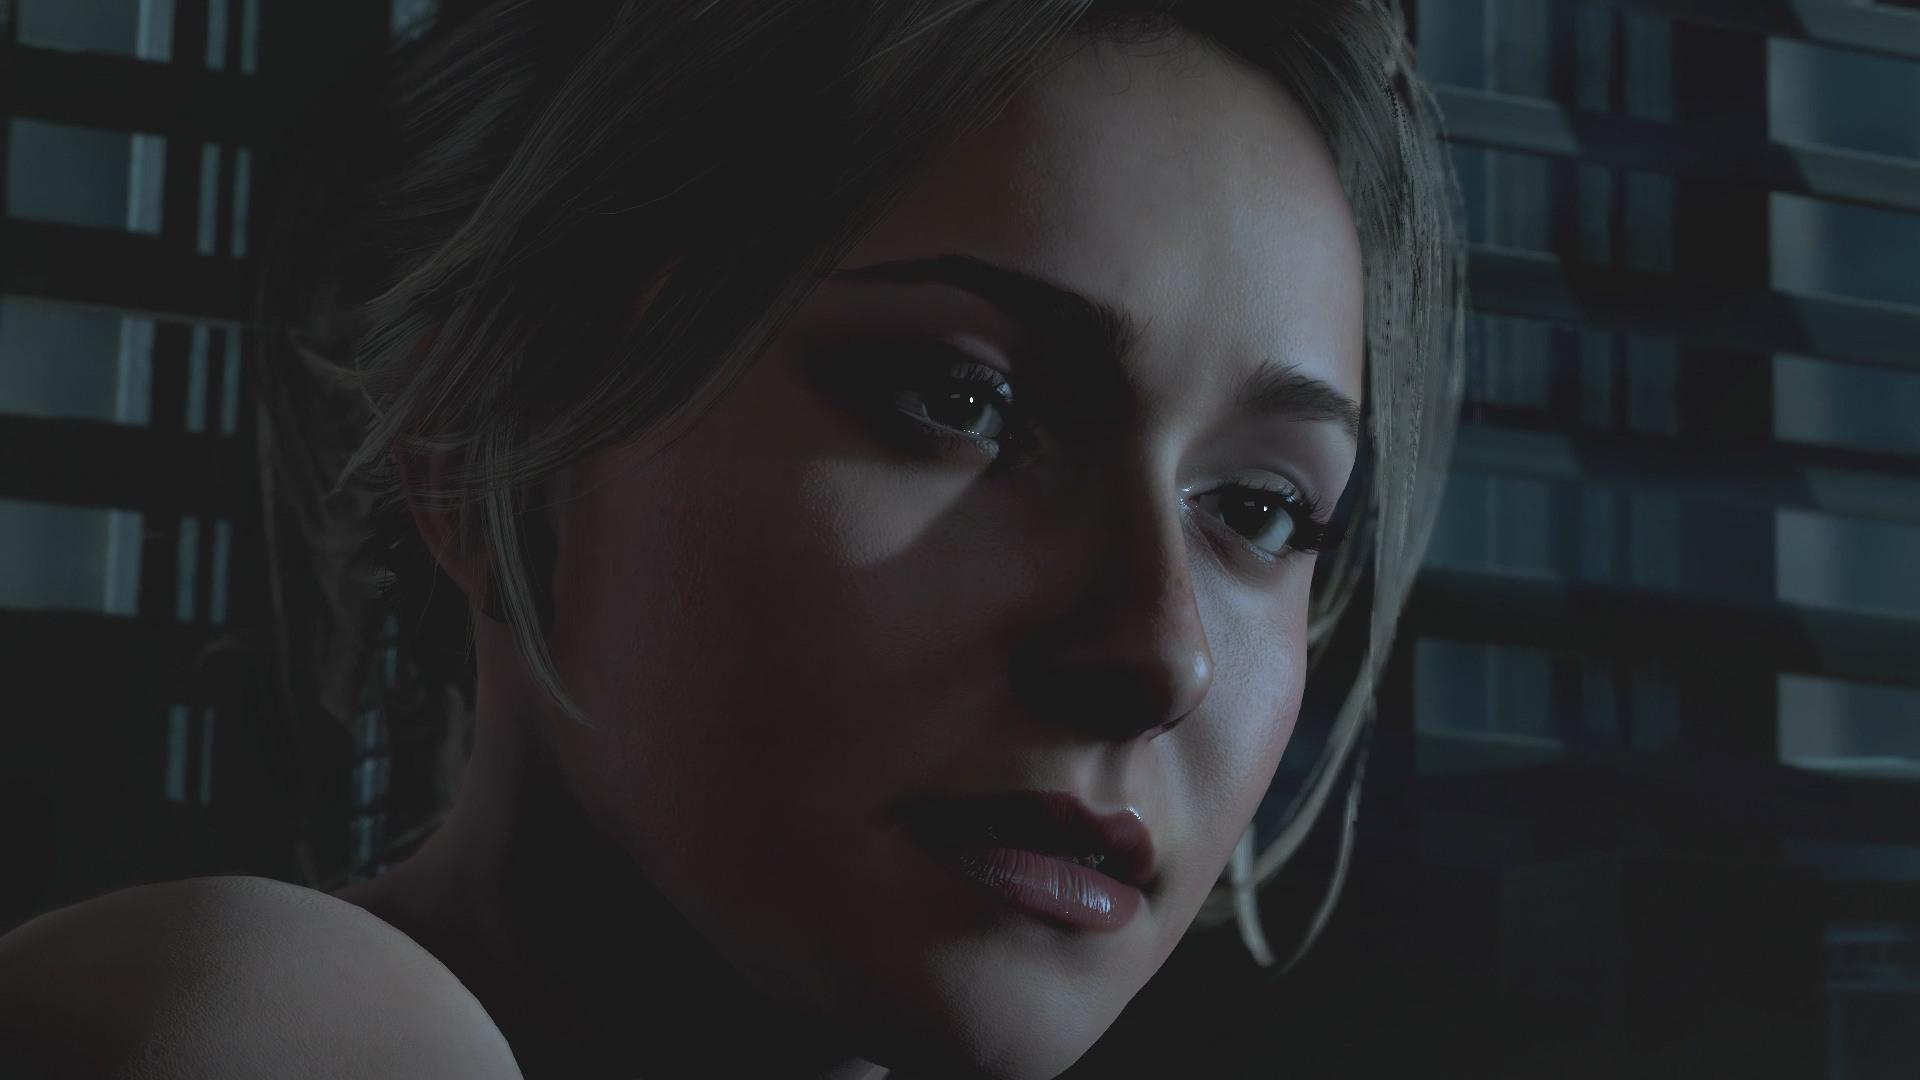 Killzone Shadow Fall Ps4 Wallpaper Until Dawn Direct Feed Screenshots Showcase The Impressive